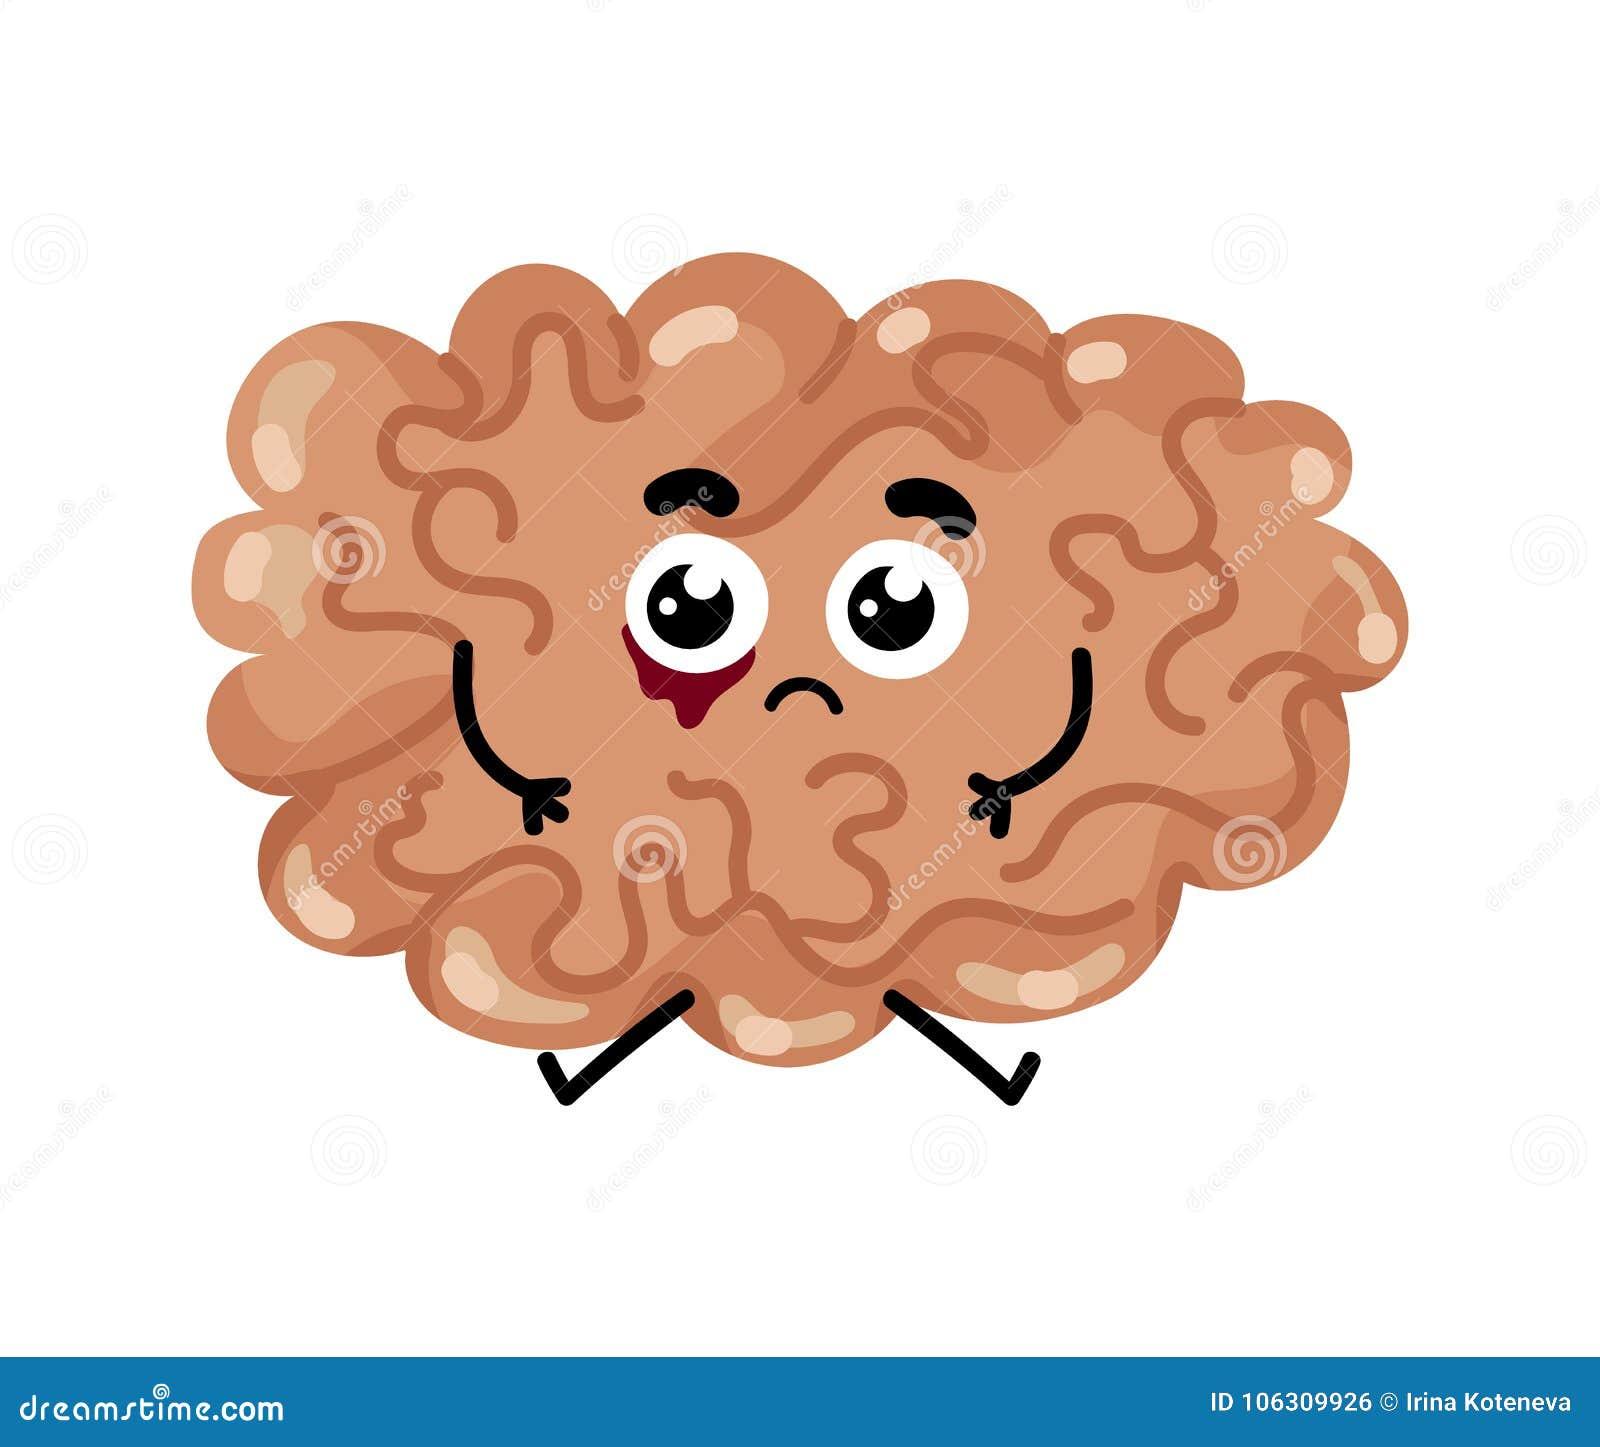 Human Sick Brain Cartoon Character Stock Vector Illustration Of